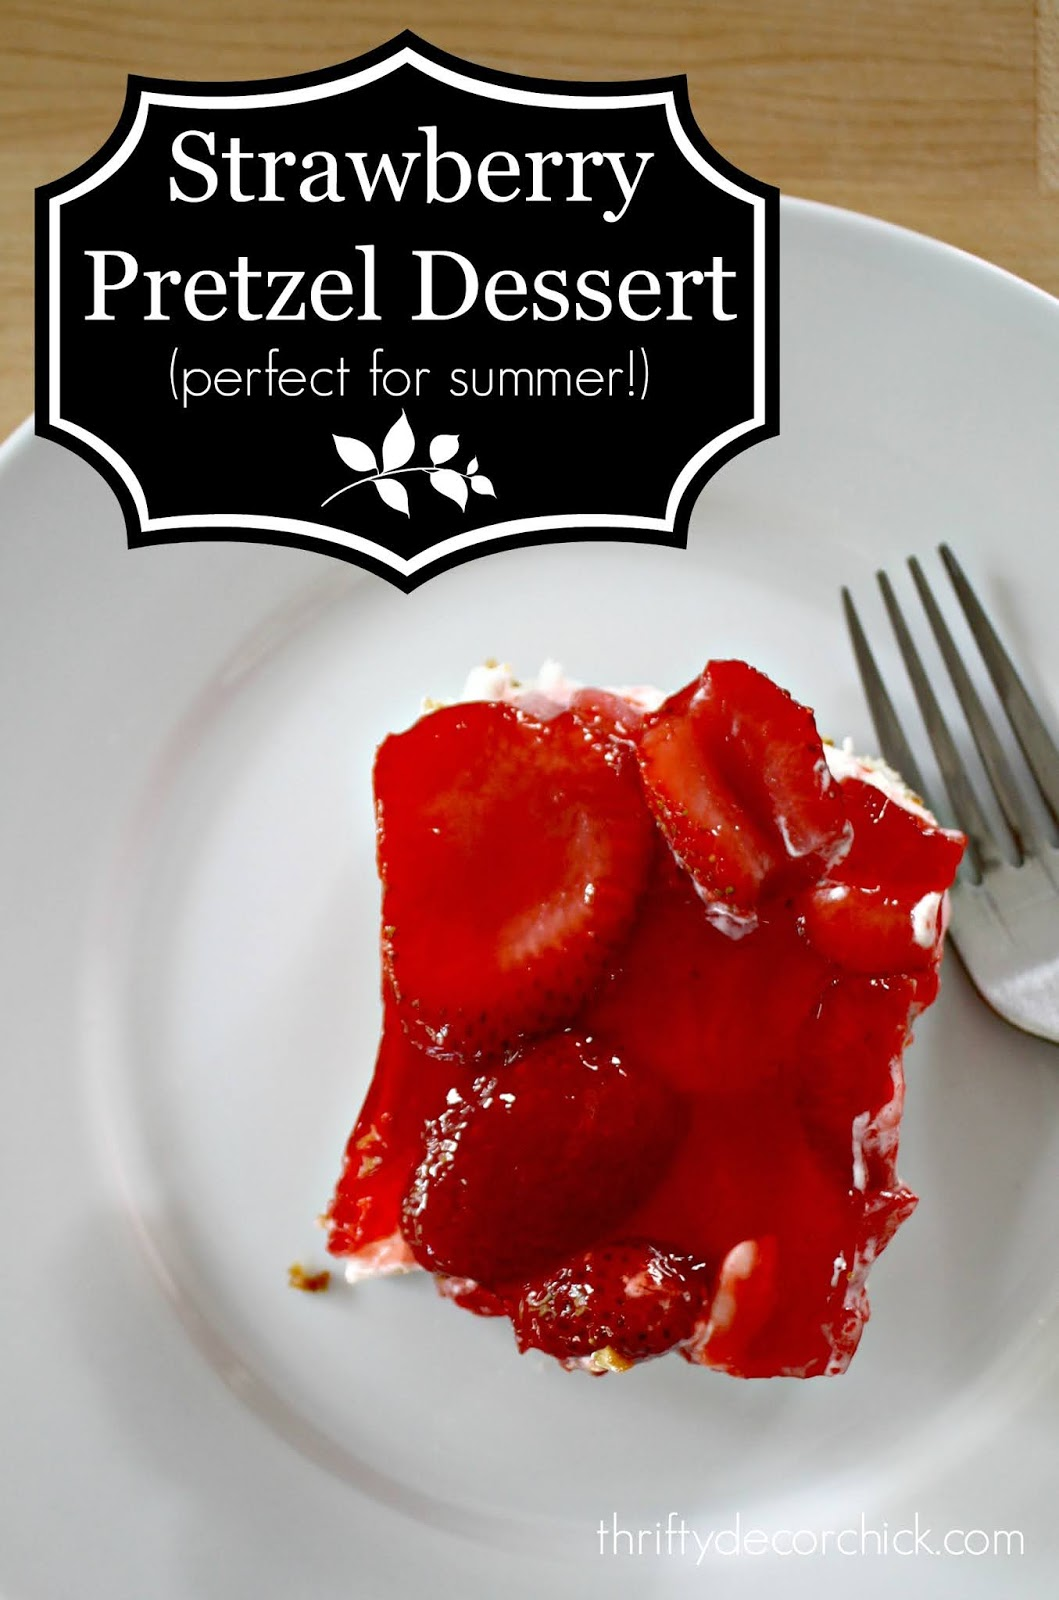 Delicious strawberry pretzel dessert